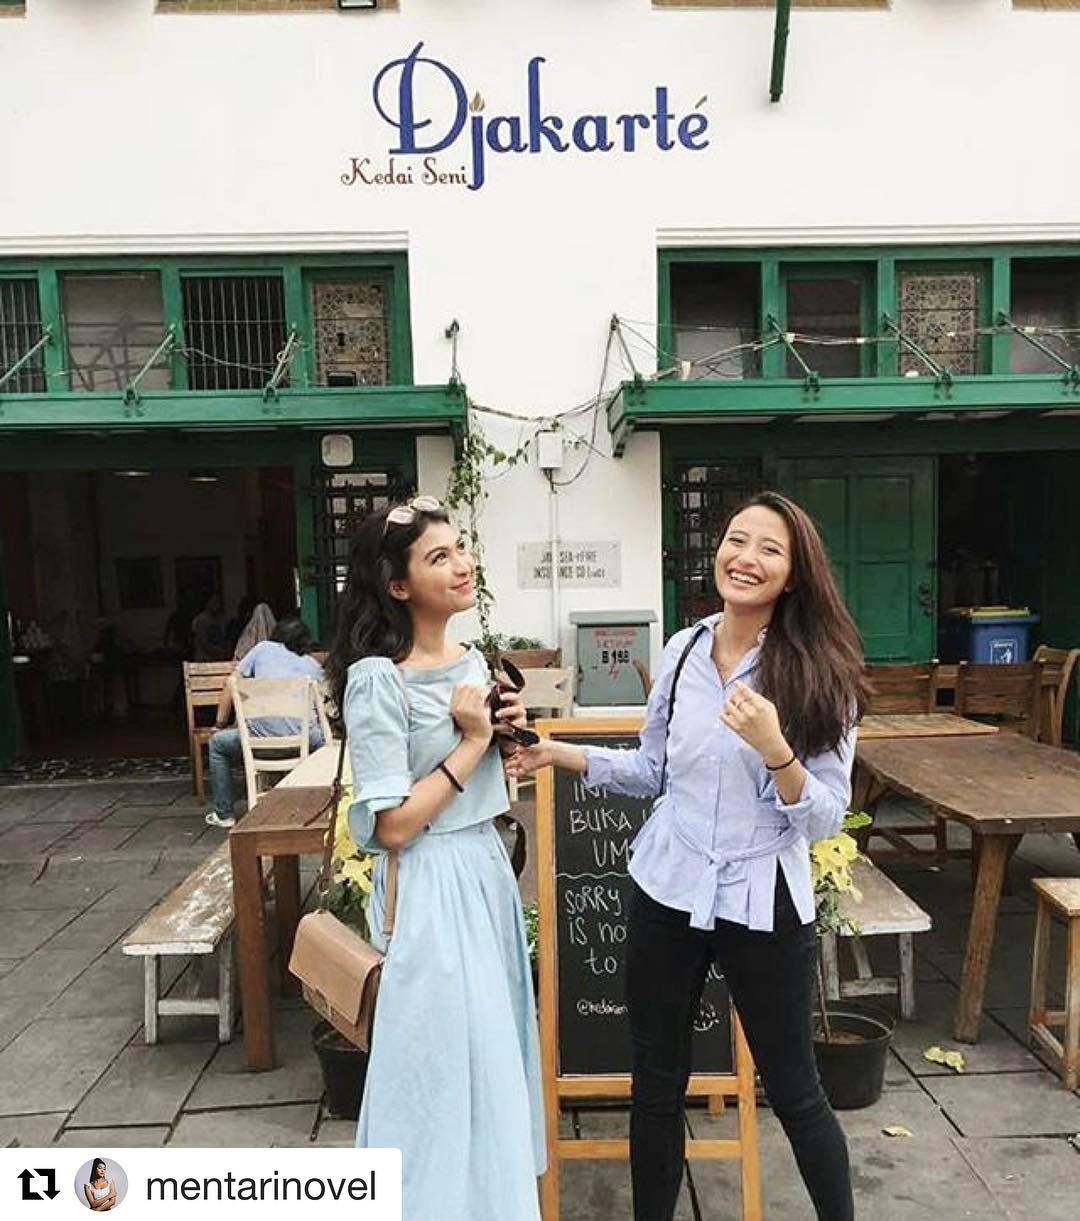 Kedai Djakarte (instagram)